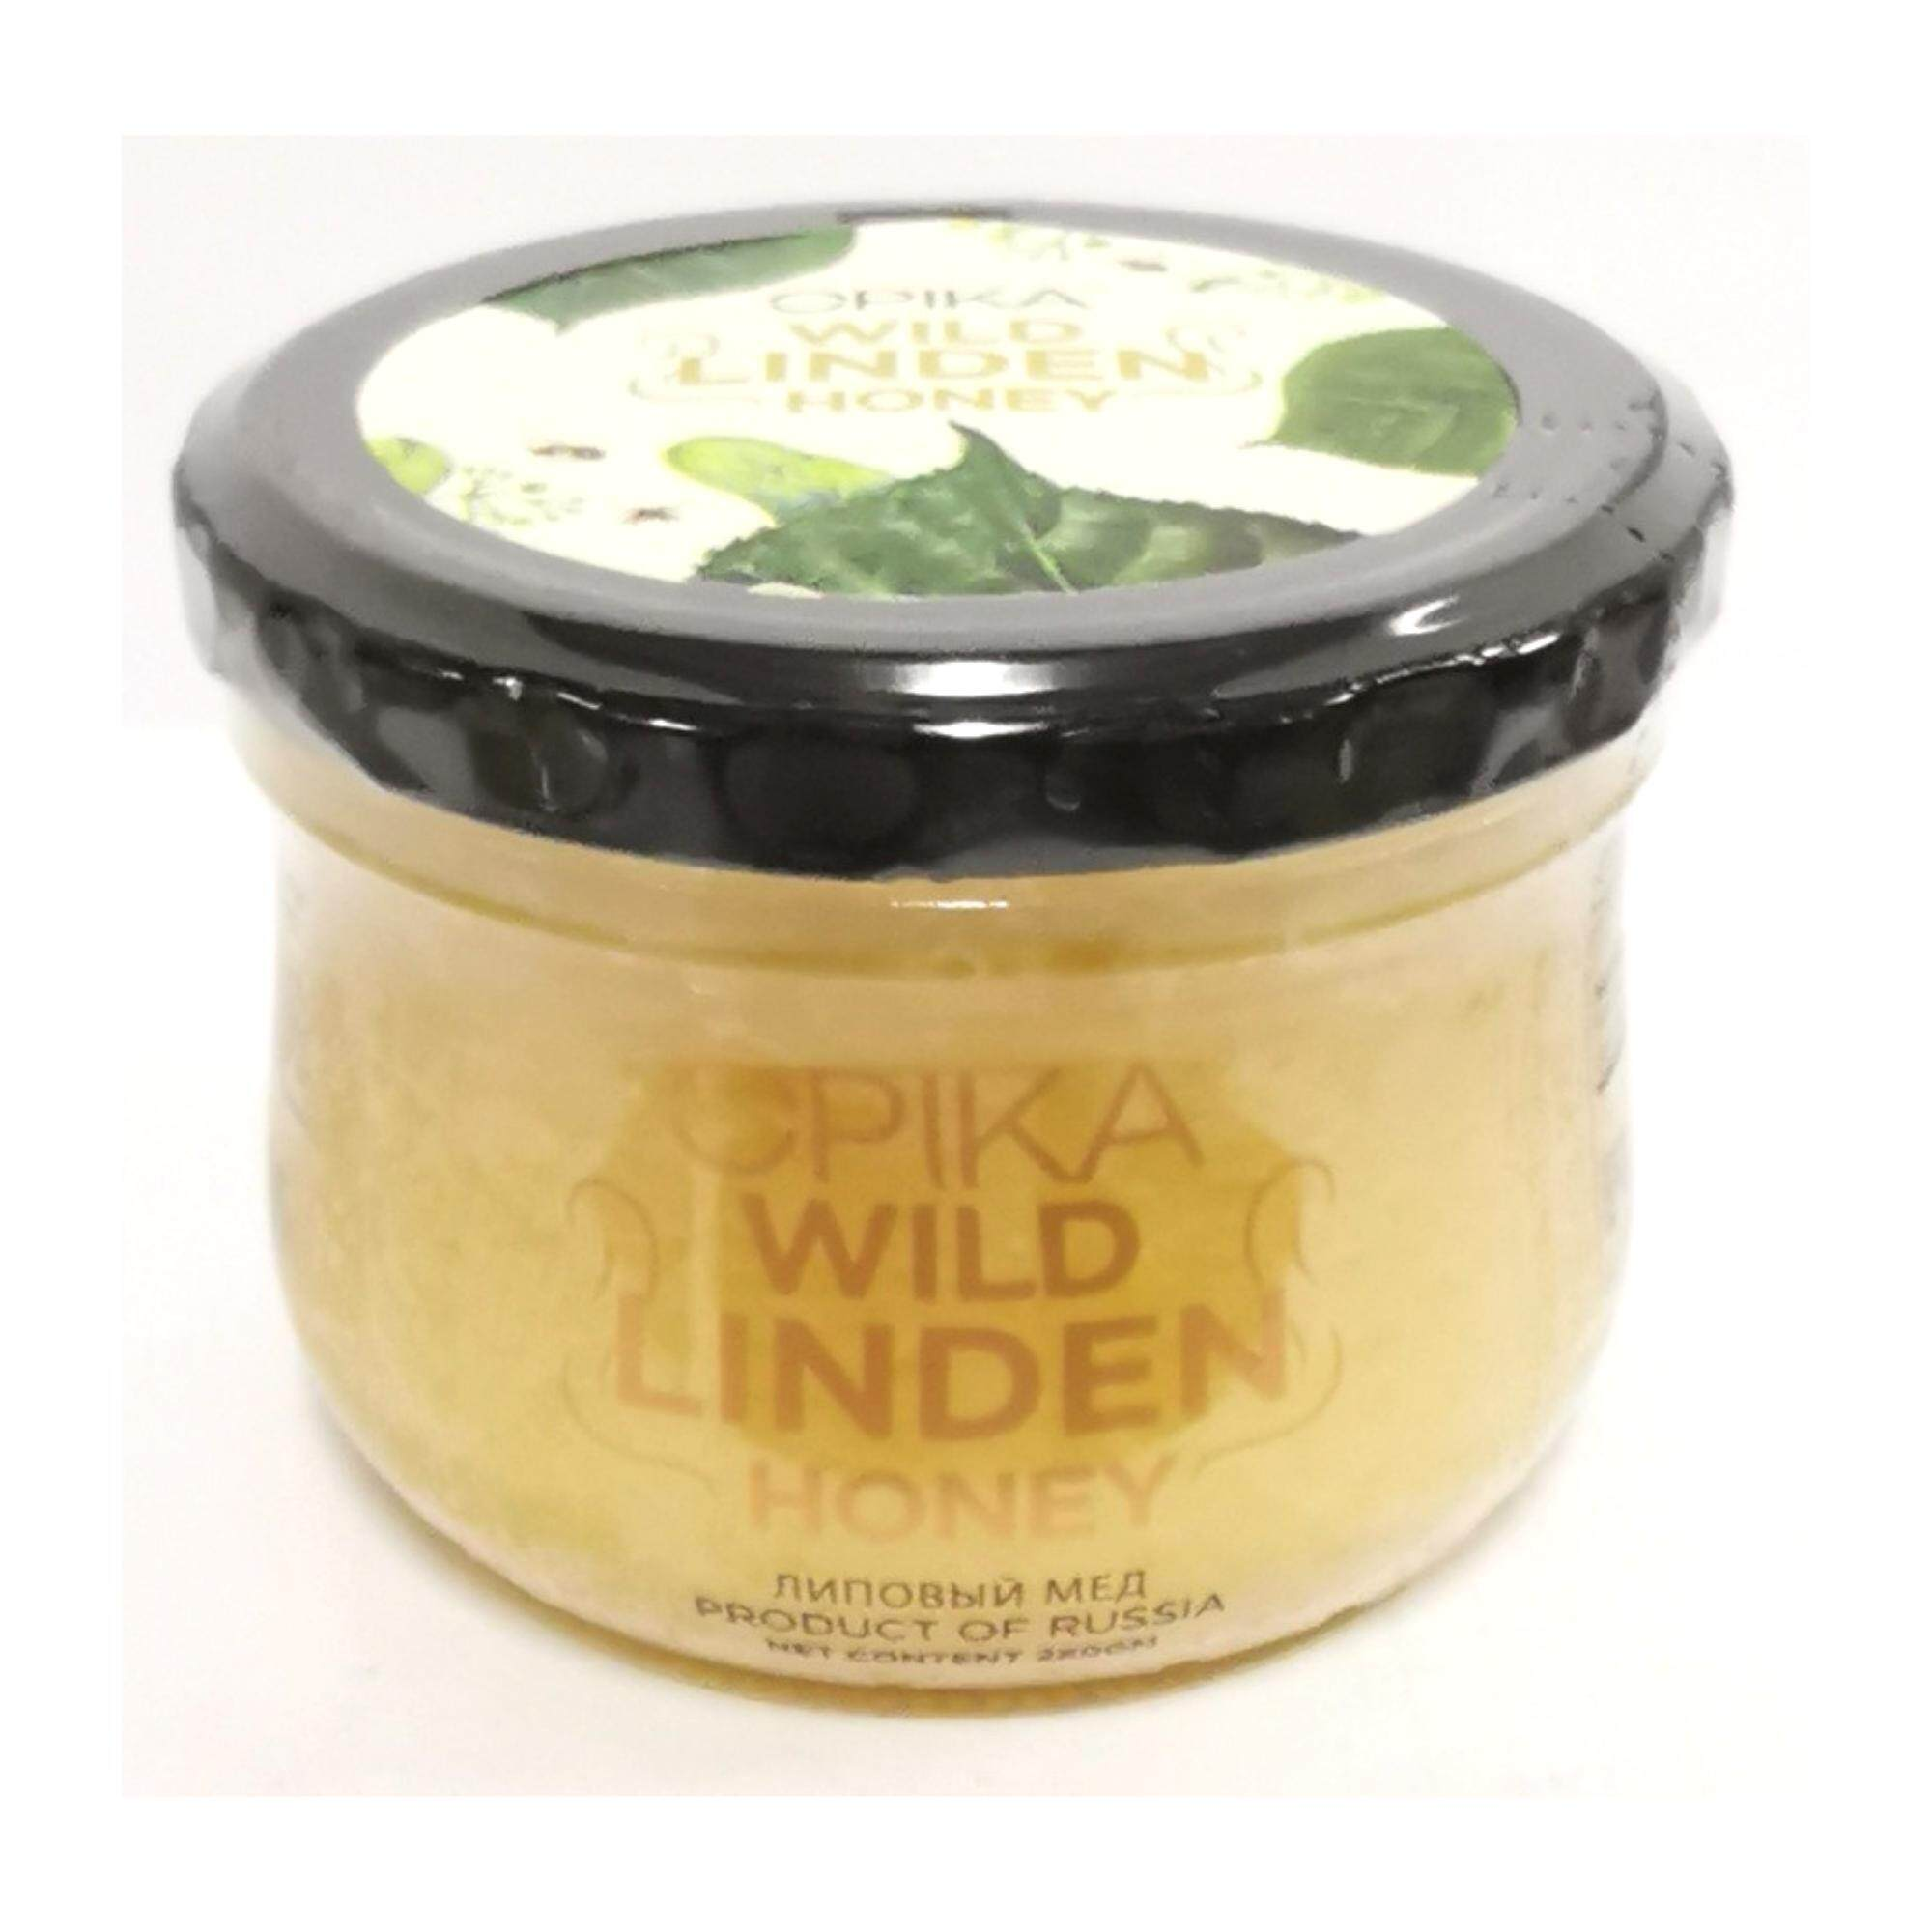 Opika White Russian Linden Honey - 280gm By Opika Organic Sdn Bhd.